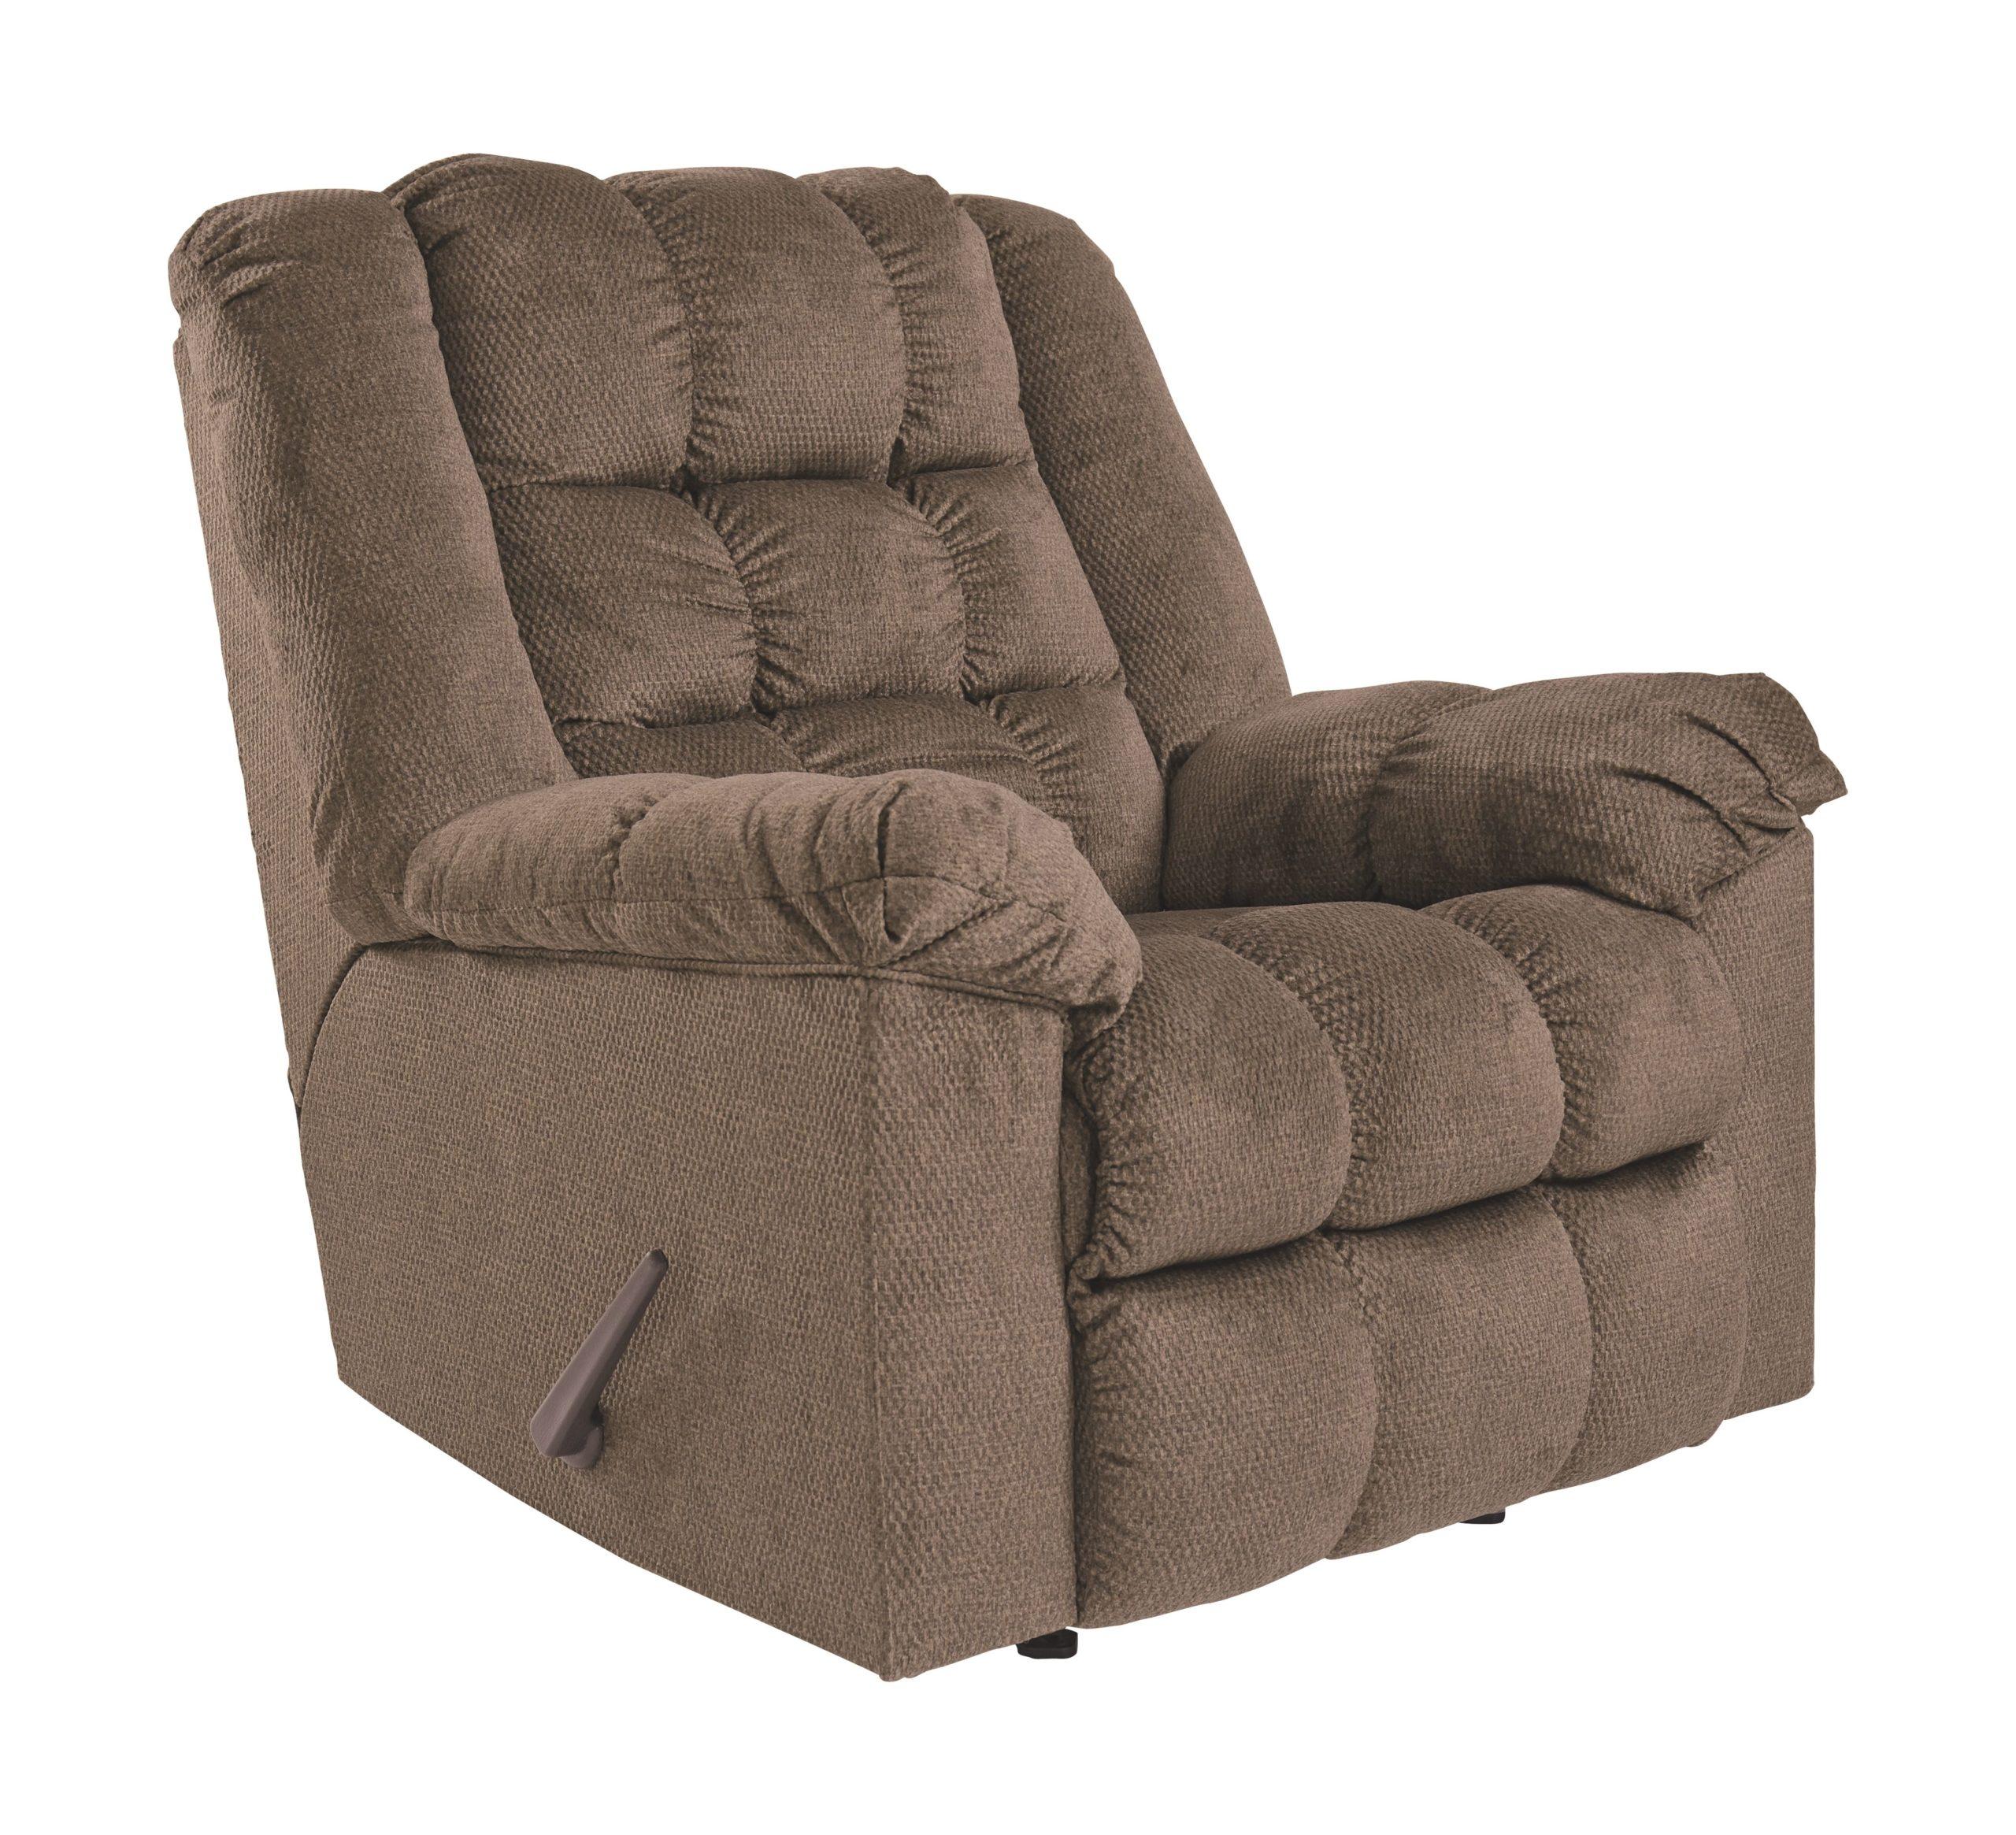 Drakestone - Autumn - Rocker Recliner - EZ Furniture Sales ... on Clare View Beige Outdoor Living Room id=50046